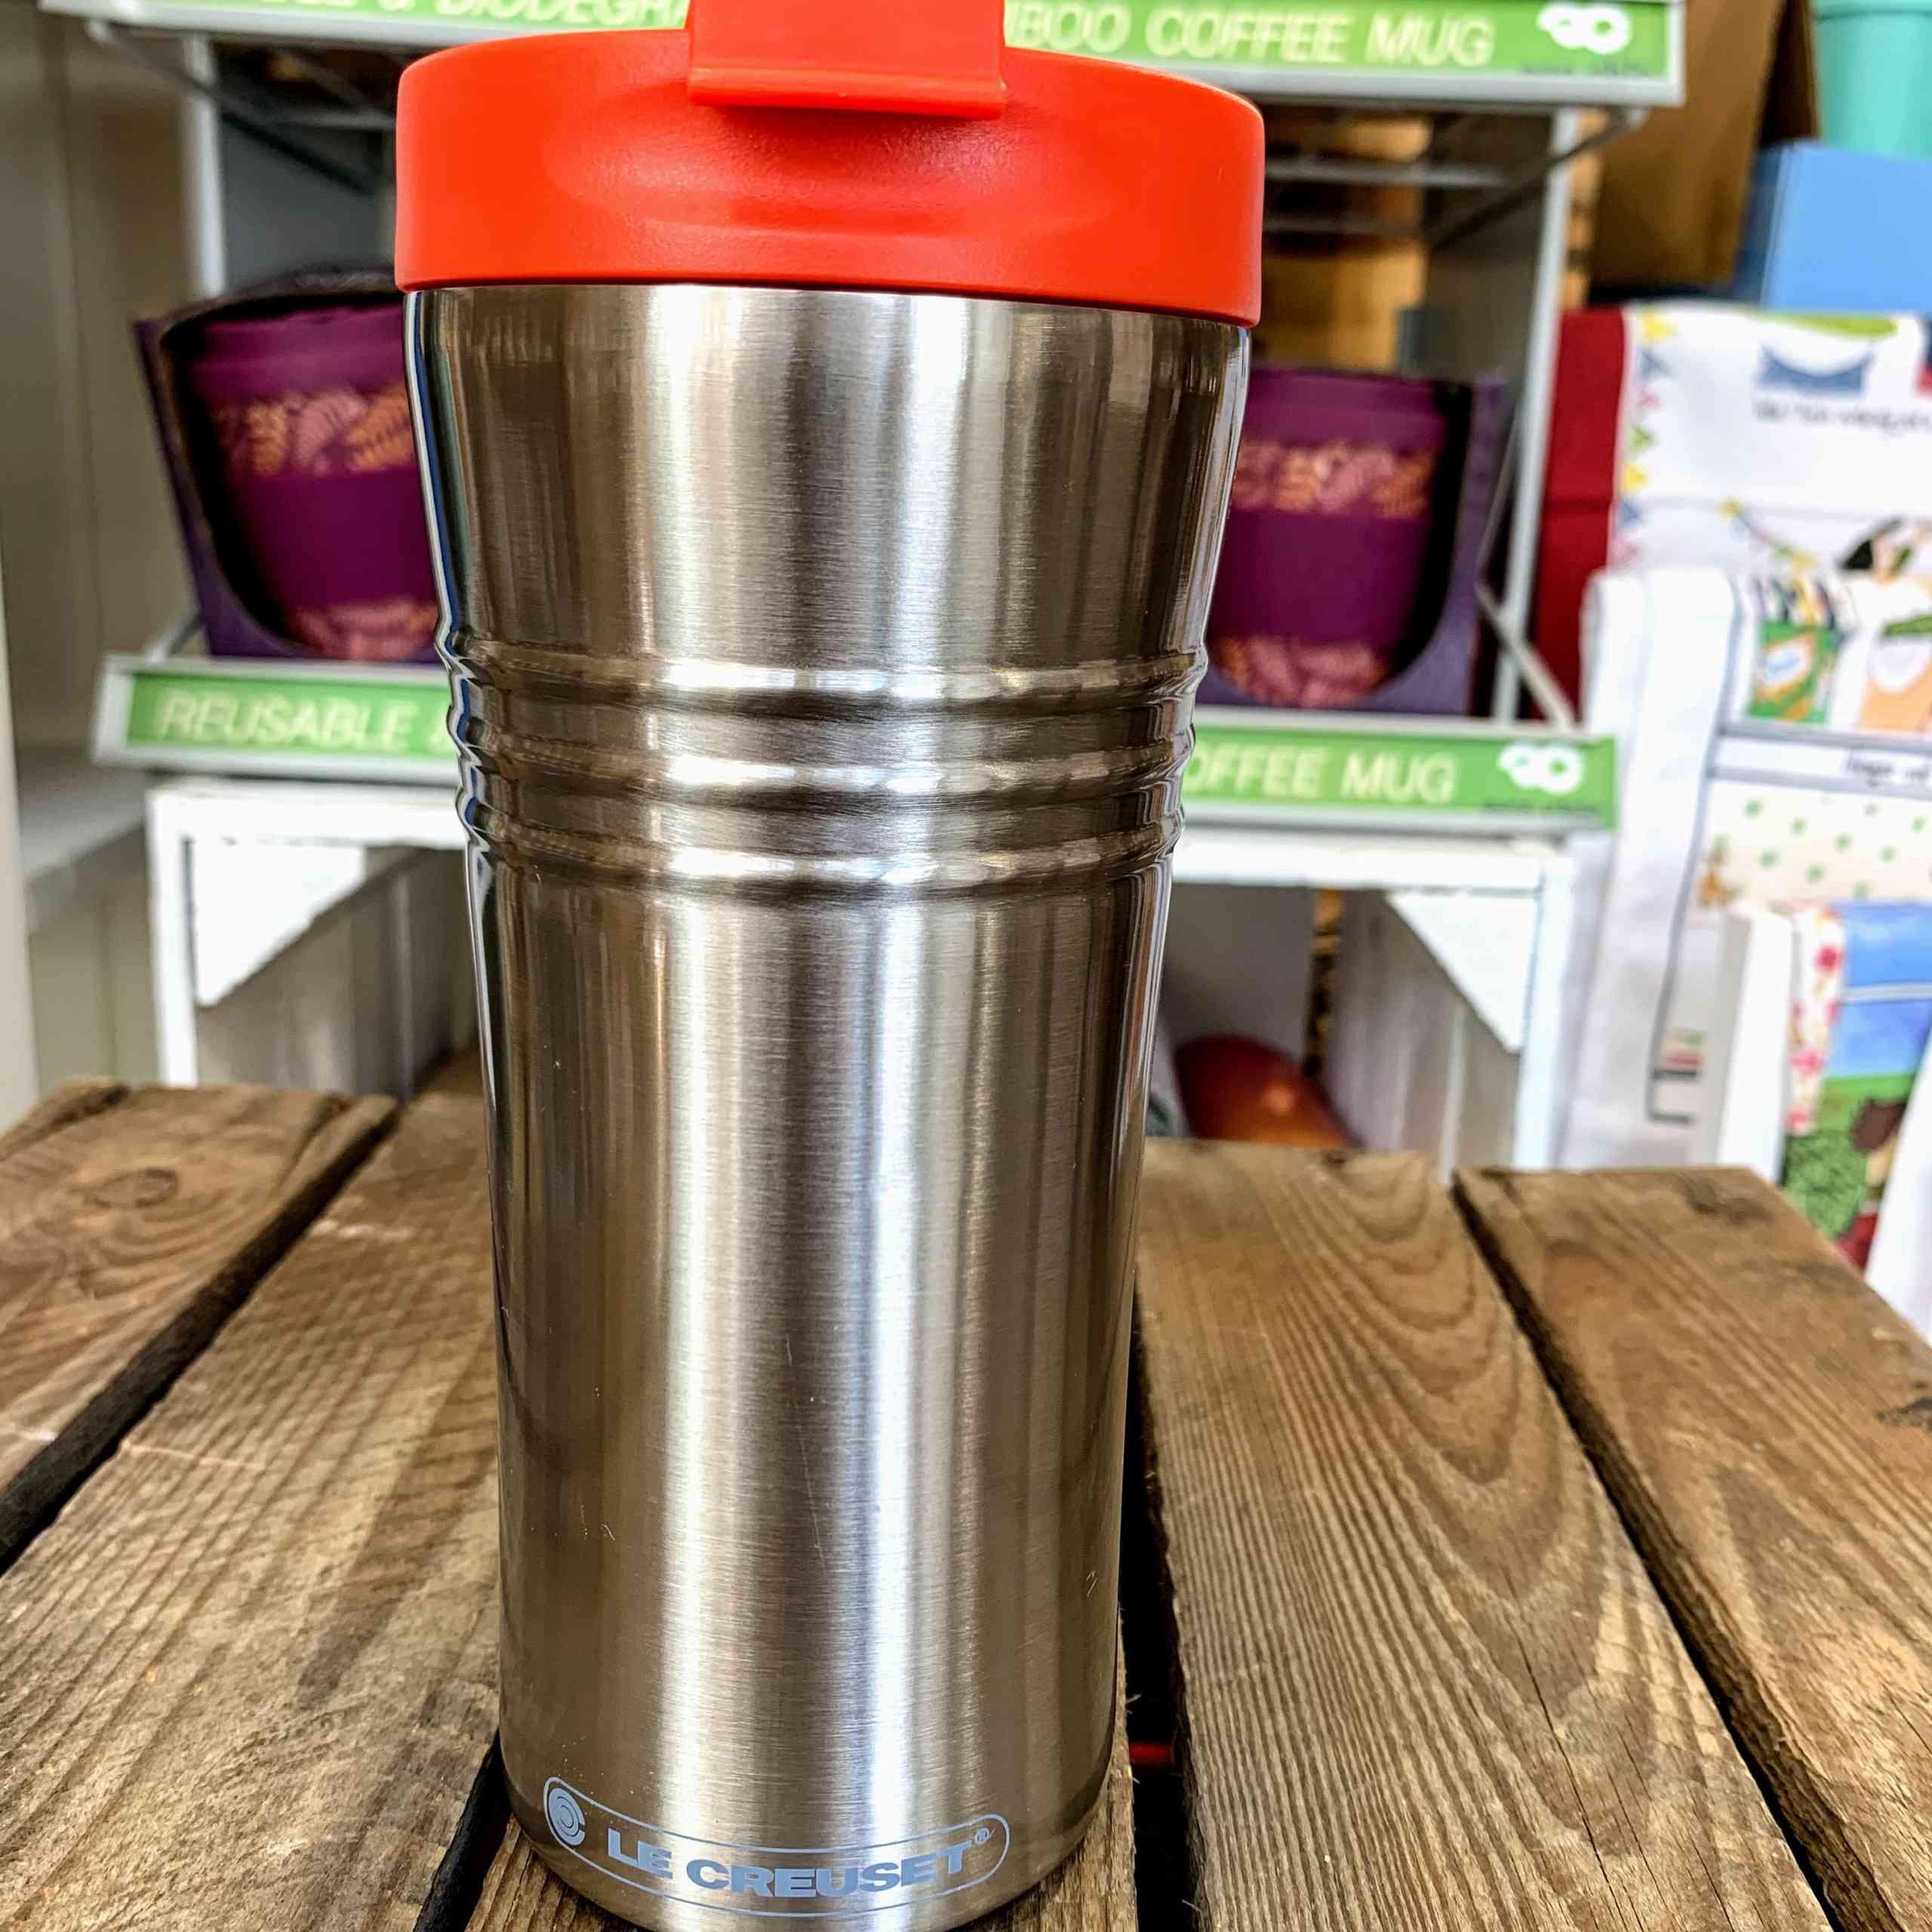 Le Creuset Travel Mug